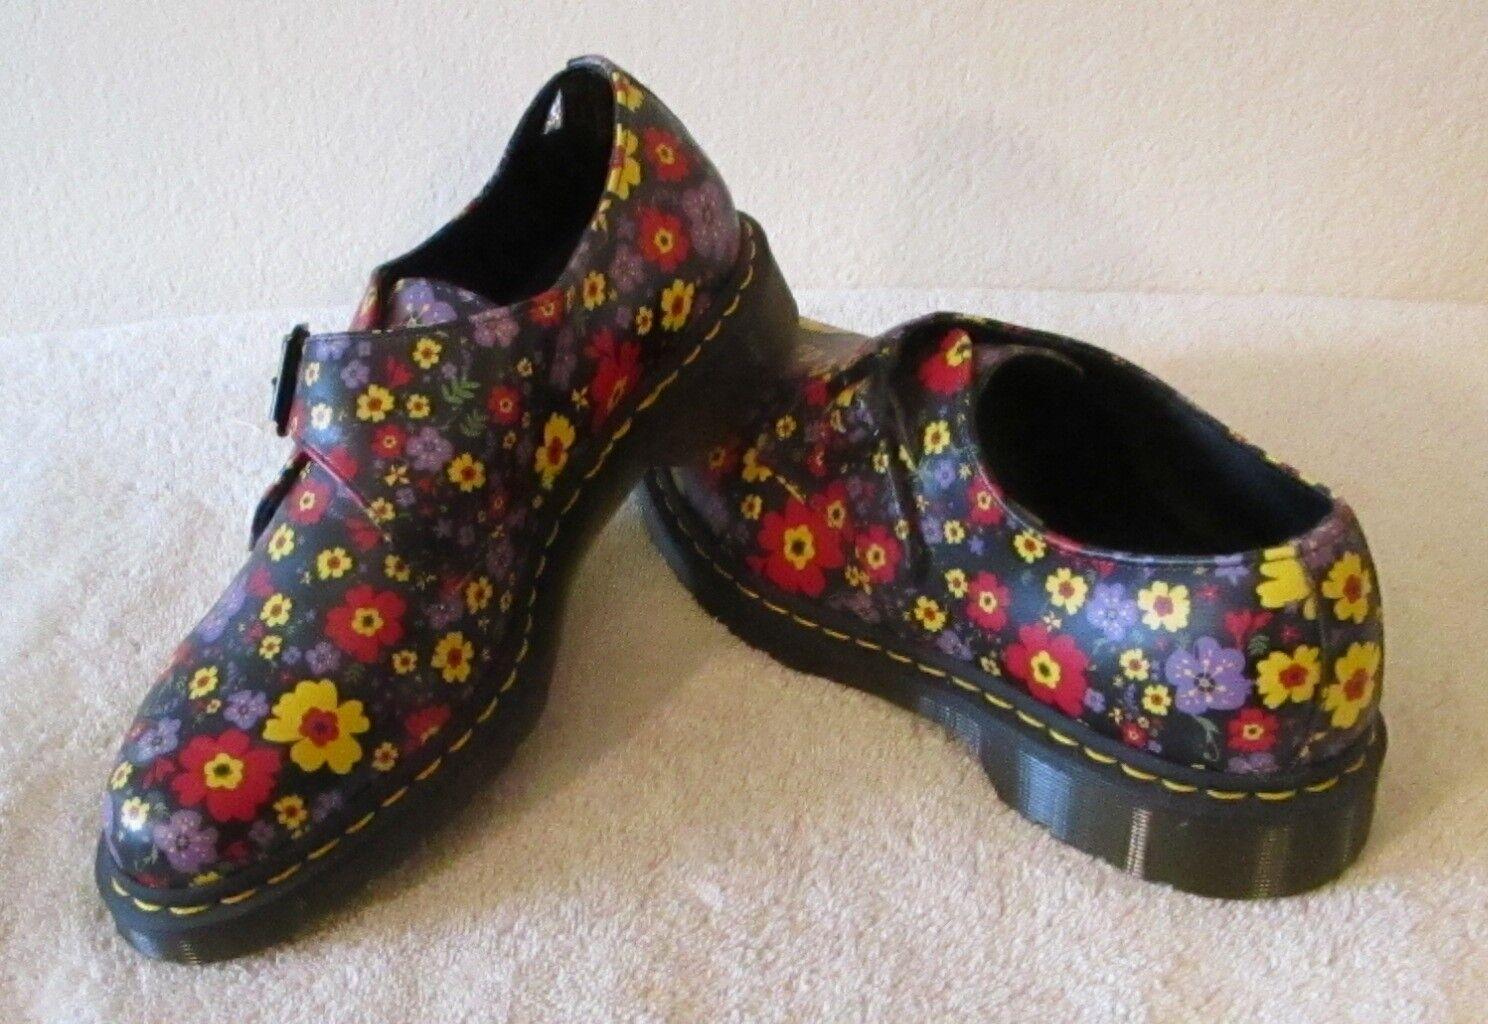 Nuevo Dr Martens Jaime monje monje monje para mujer Oxford Zapatos De Correa 11 Negro MSRP  120  producto de calidad